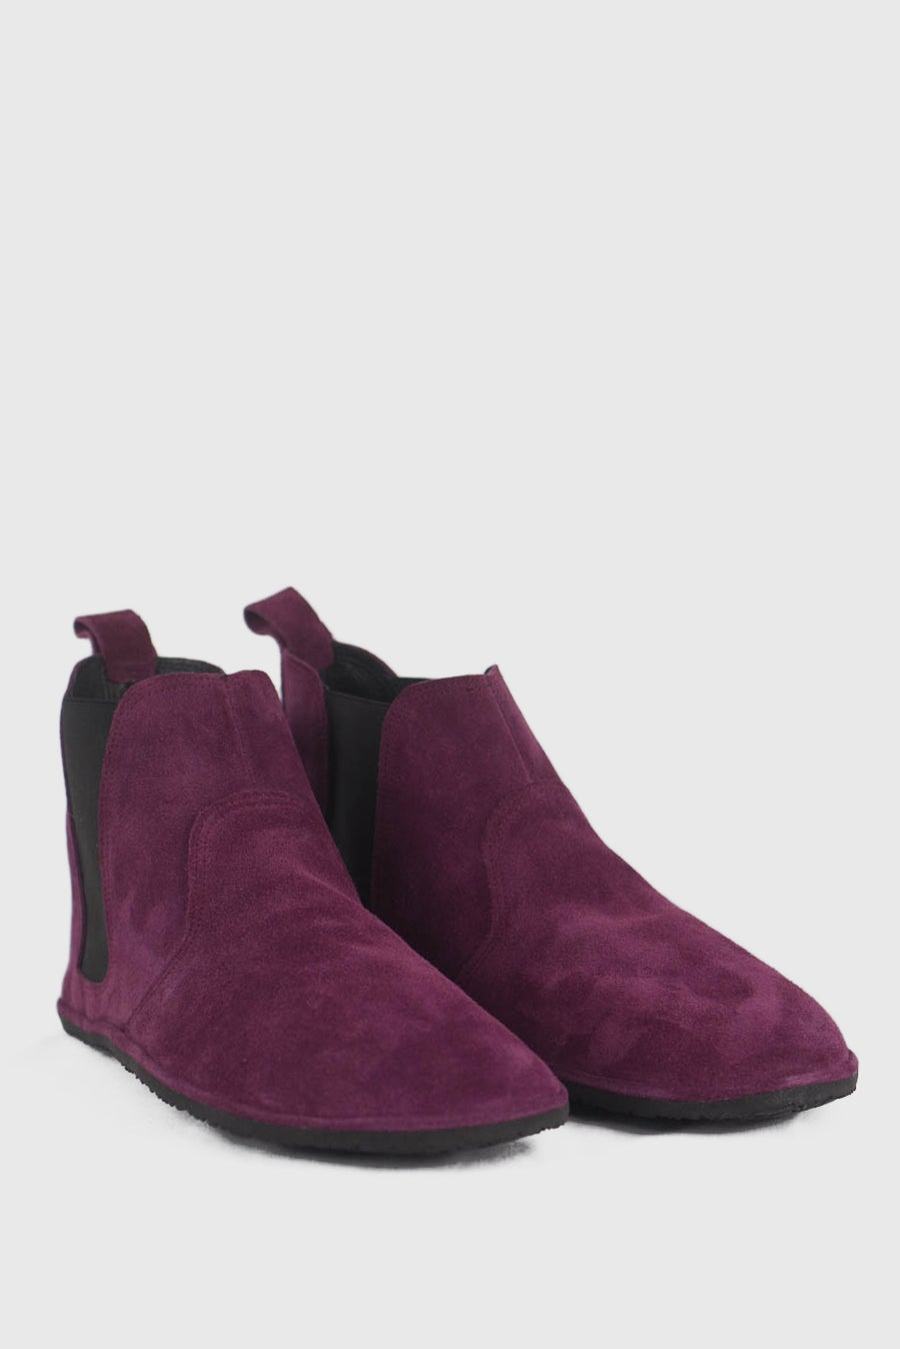 Image of Chelsea in Wine purple suede - 44.5 EU